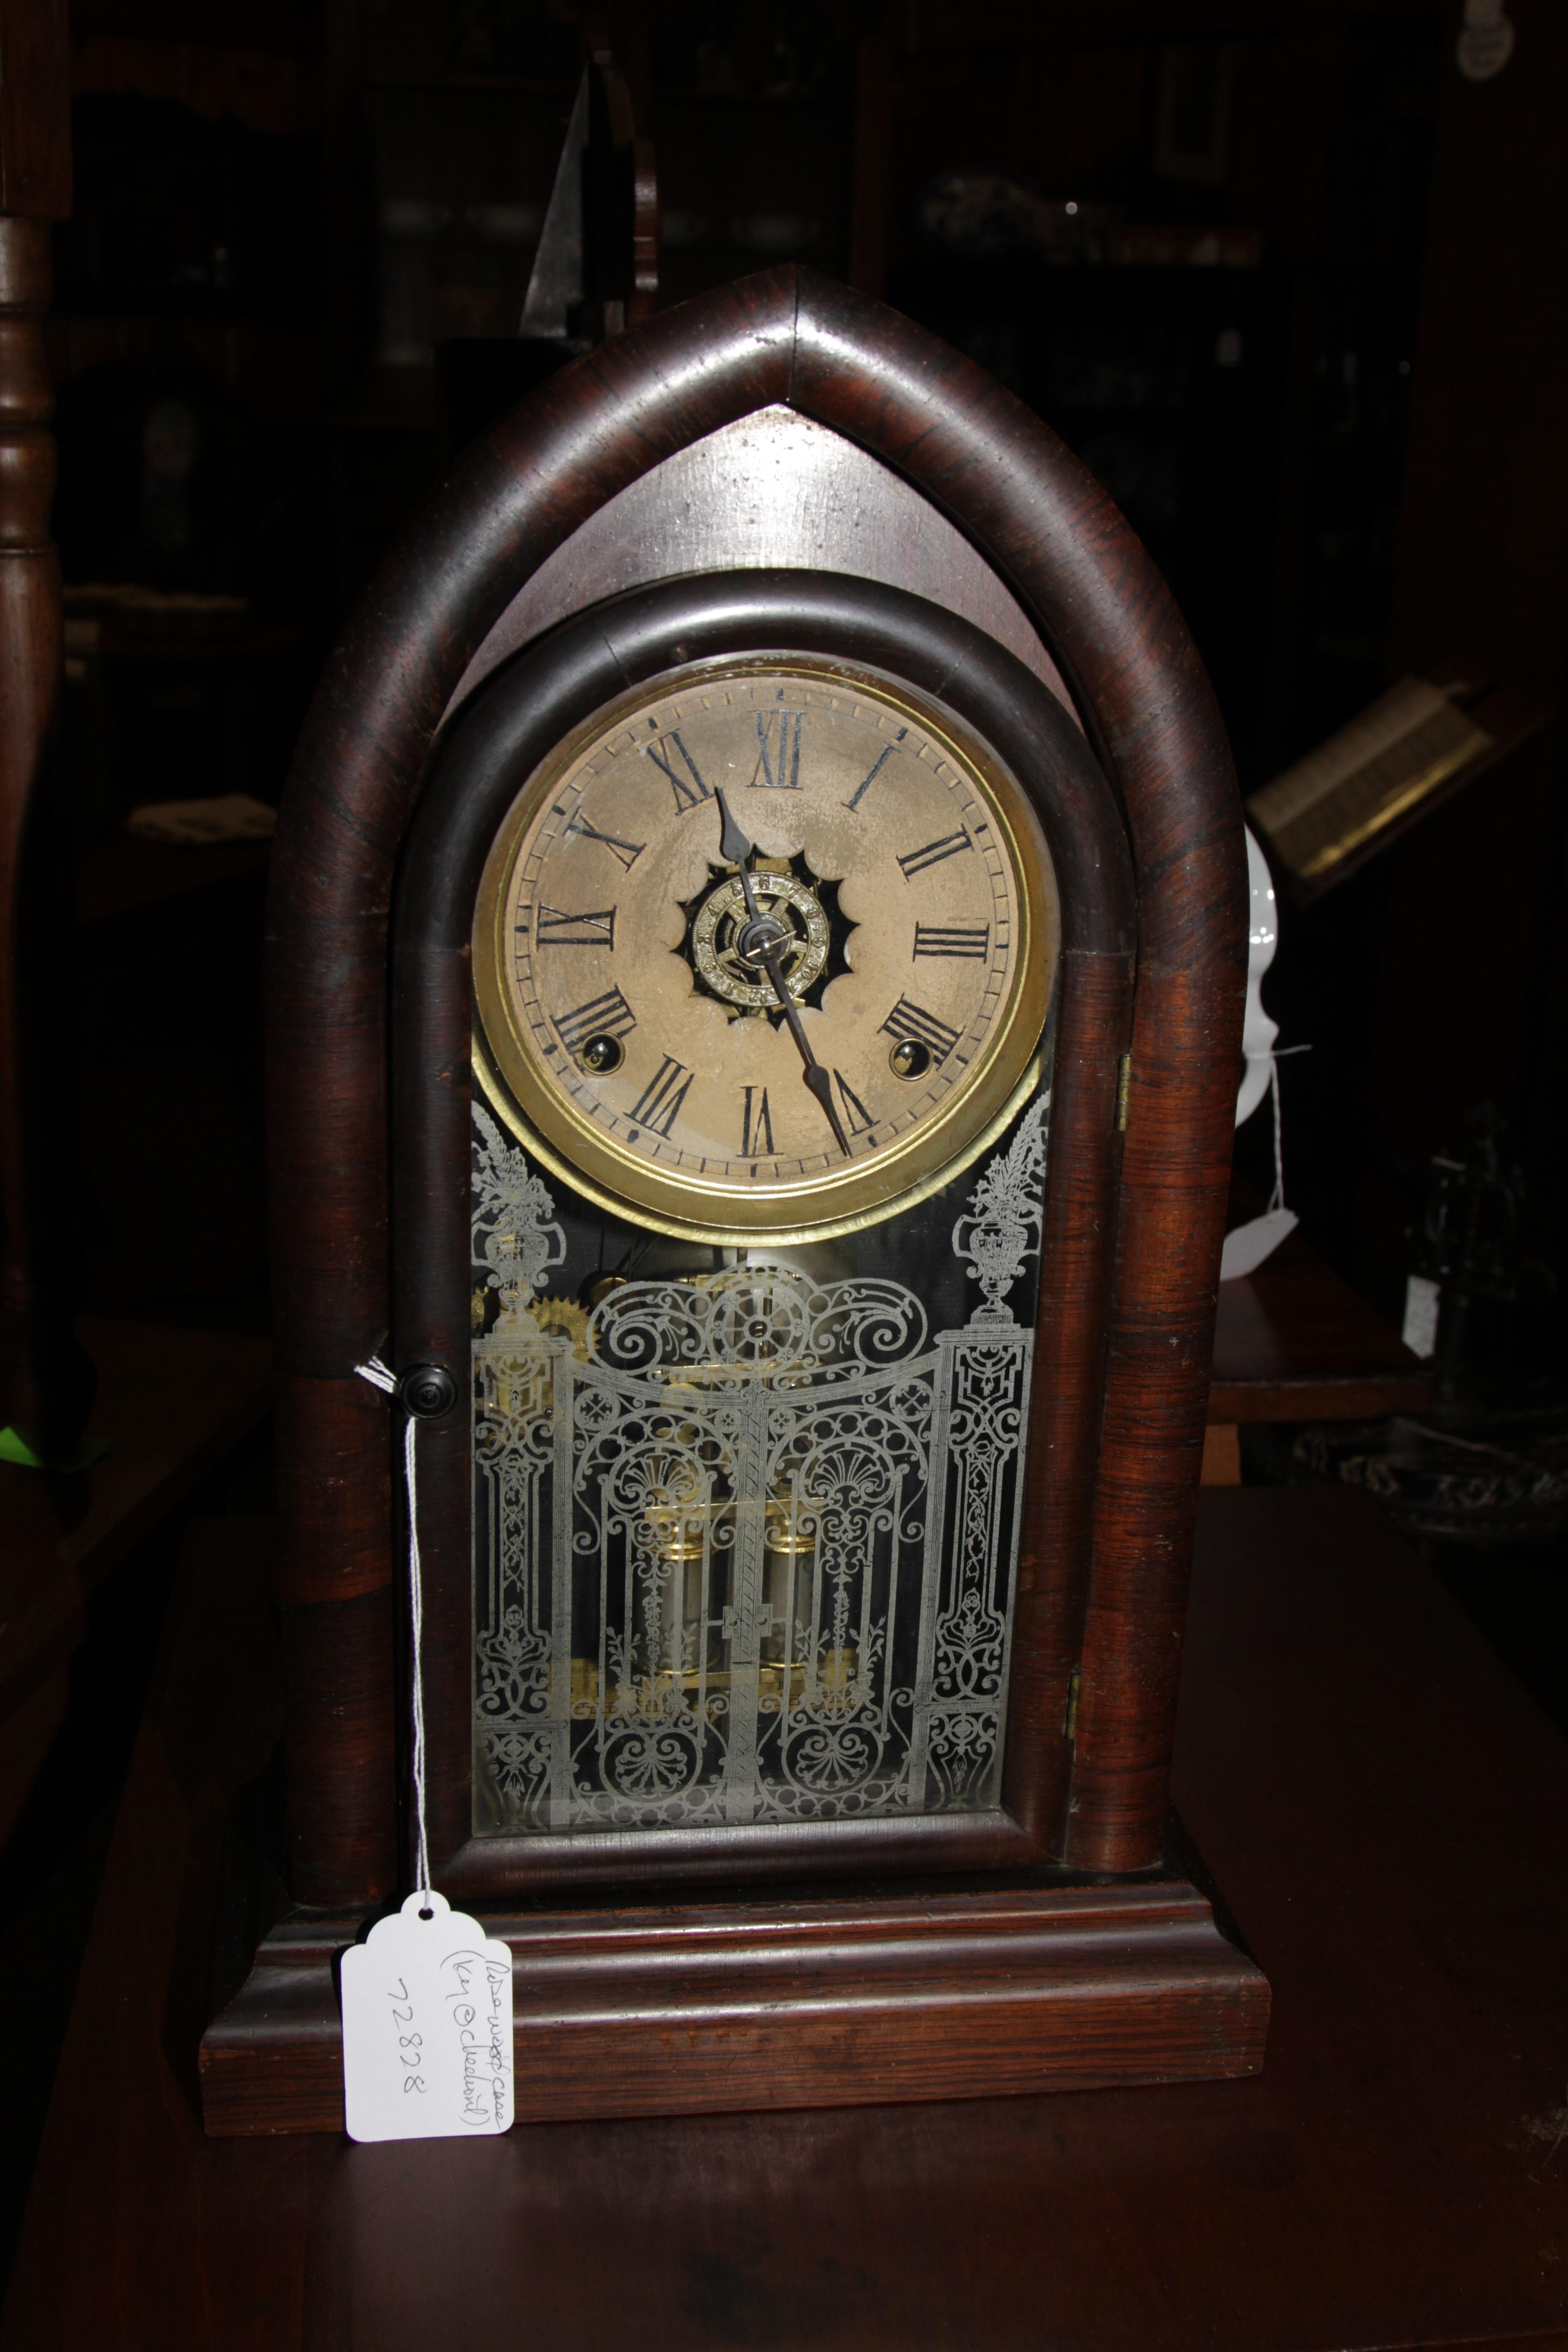 8 Day Ansonia Mantle Clock